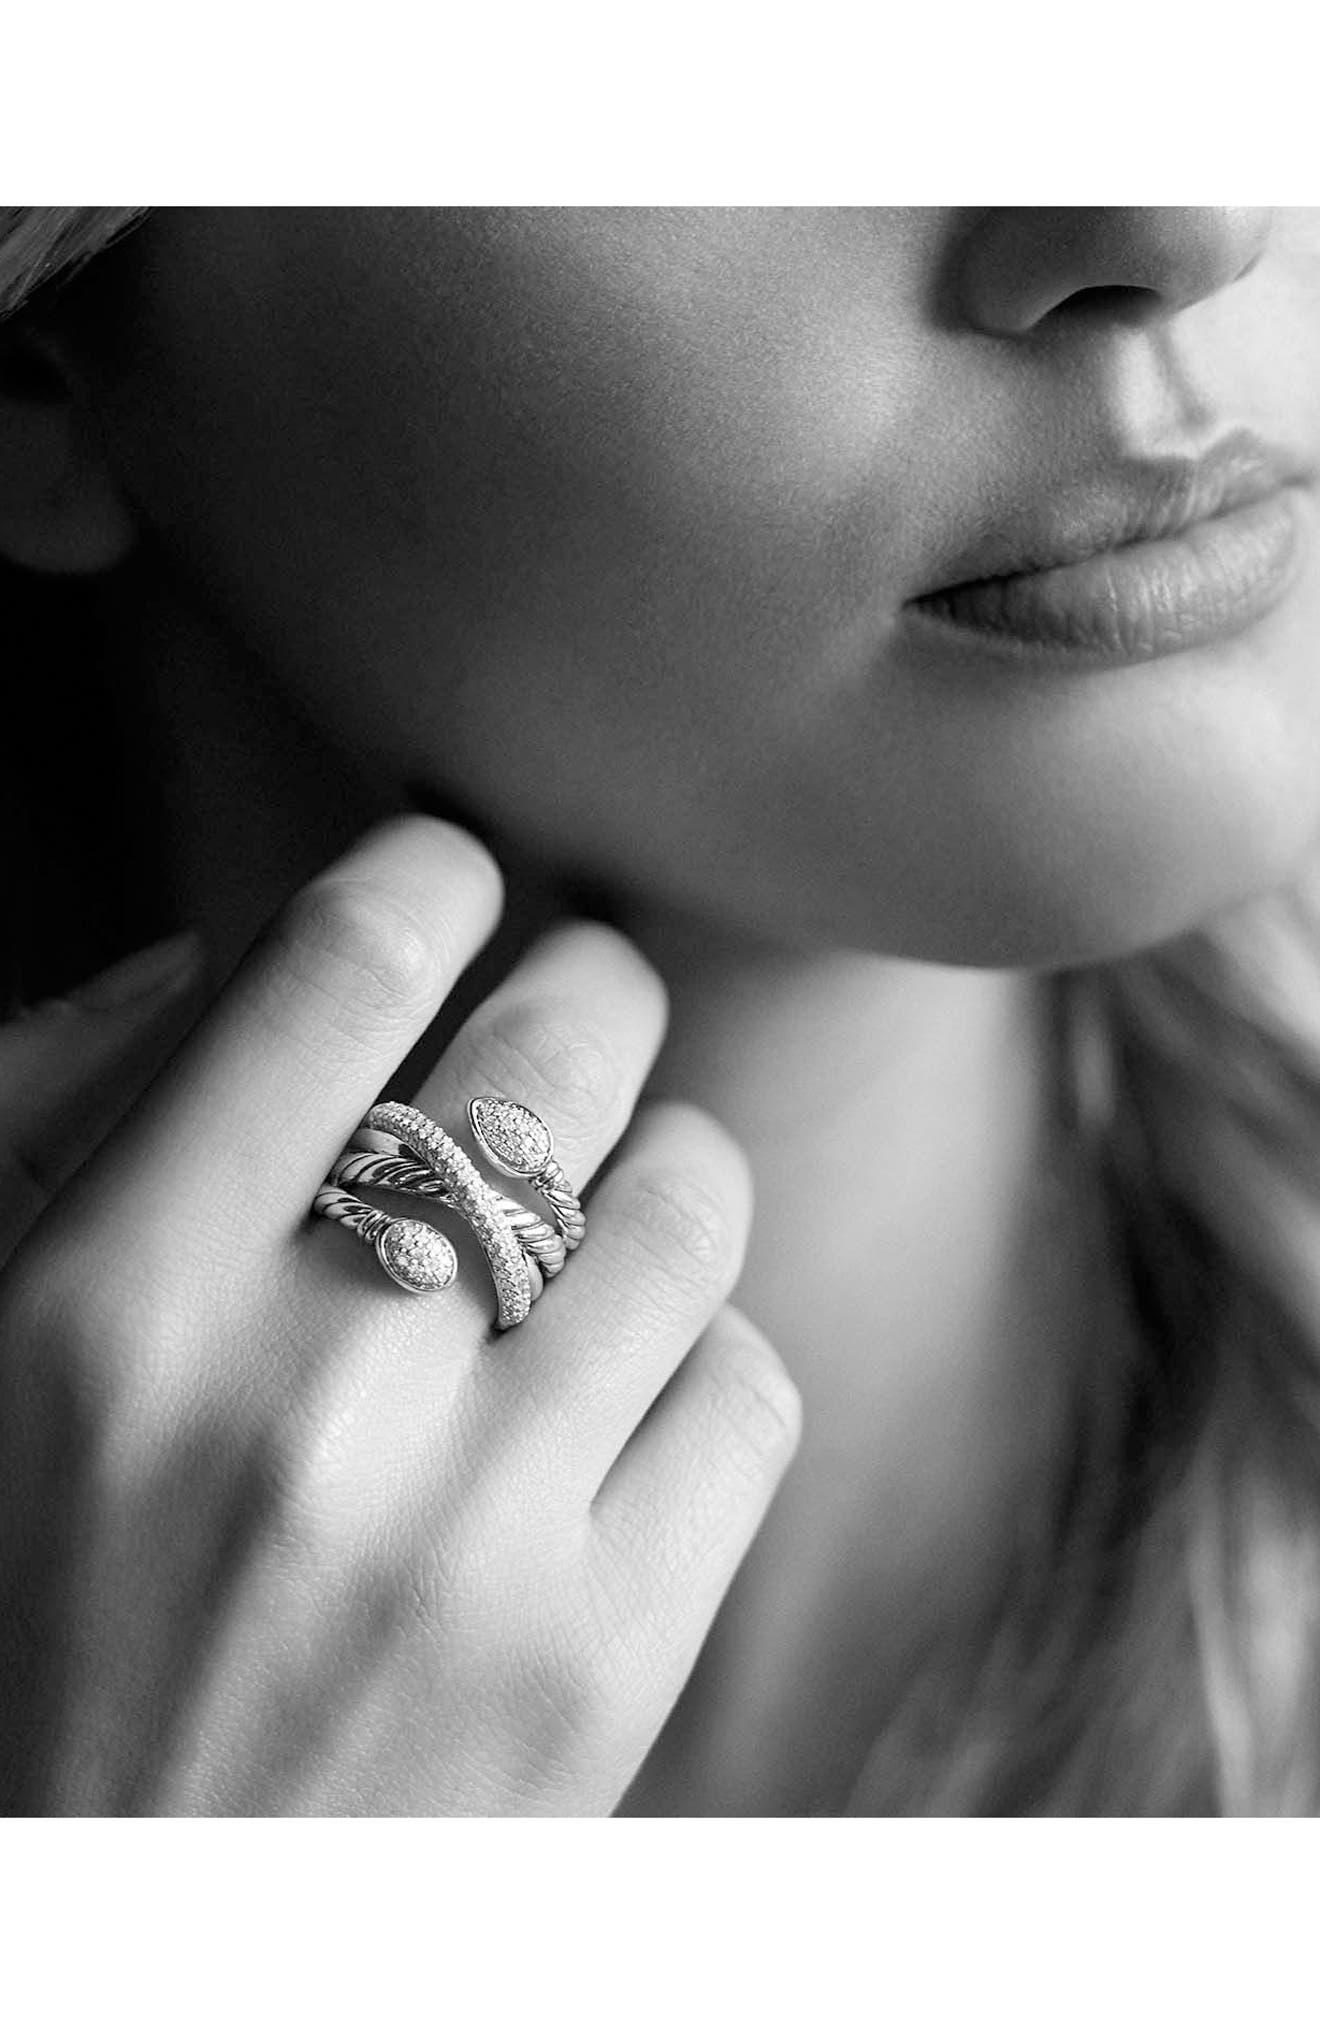 'Renaissance' Ring with Diamonds,                             Alternate thumbnail 2, color,                             040